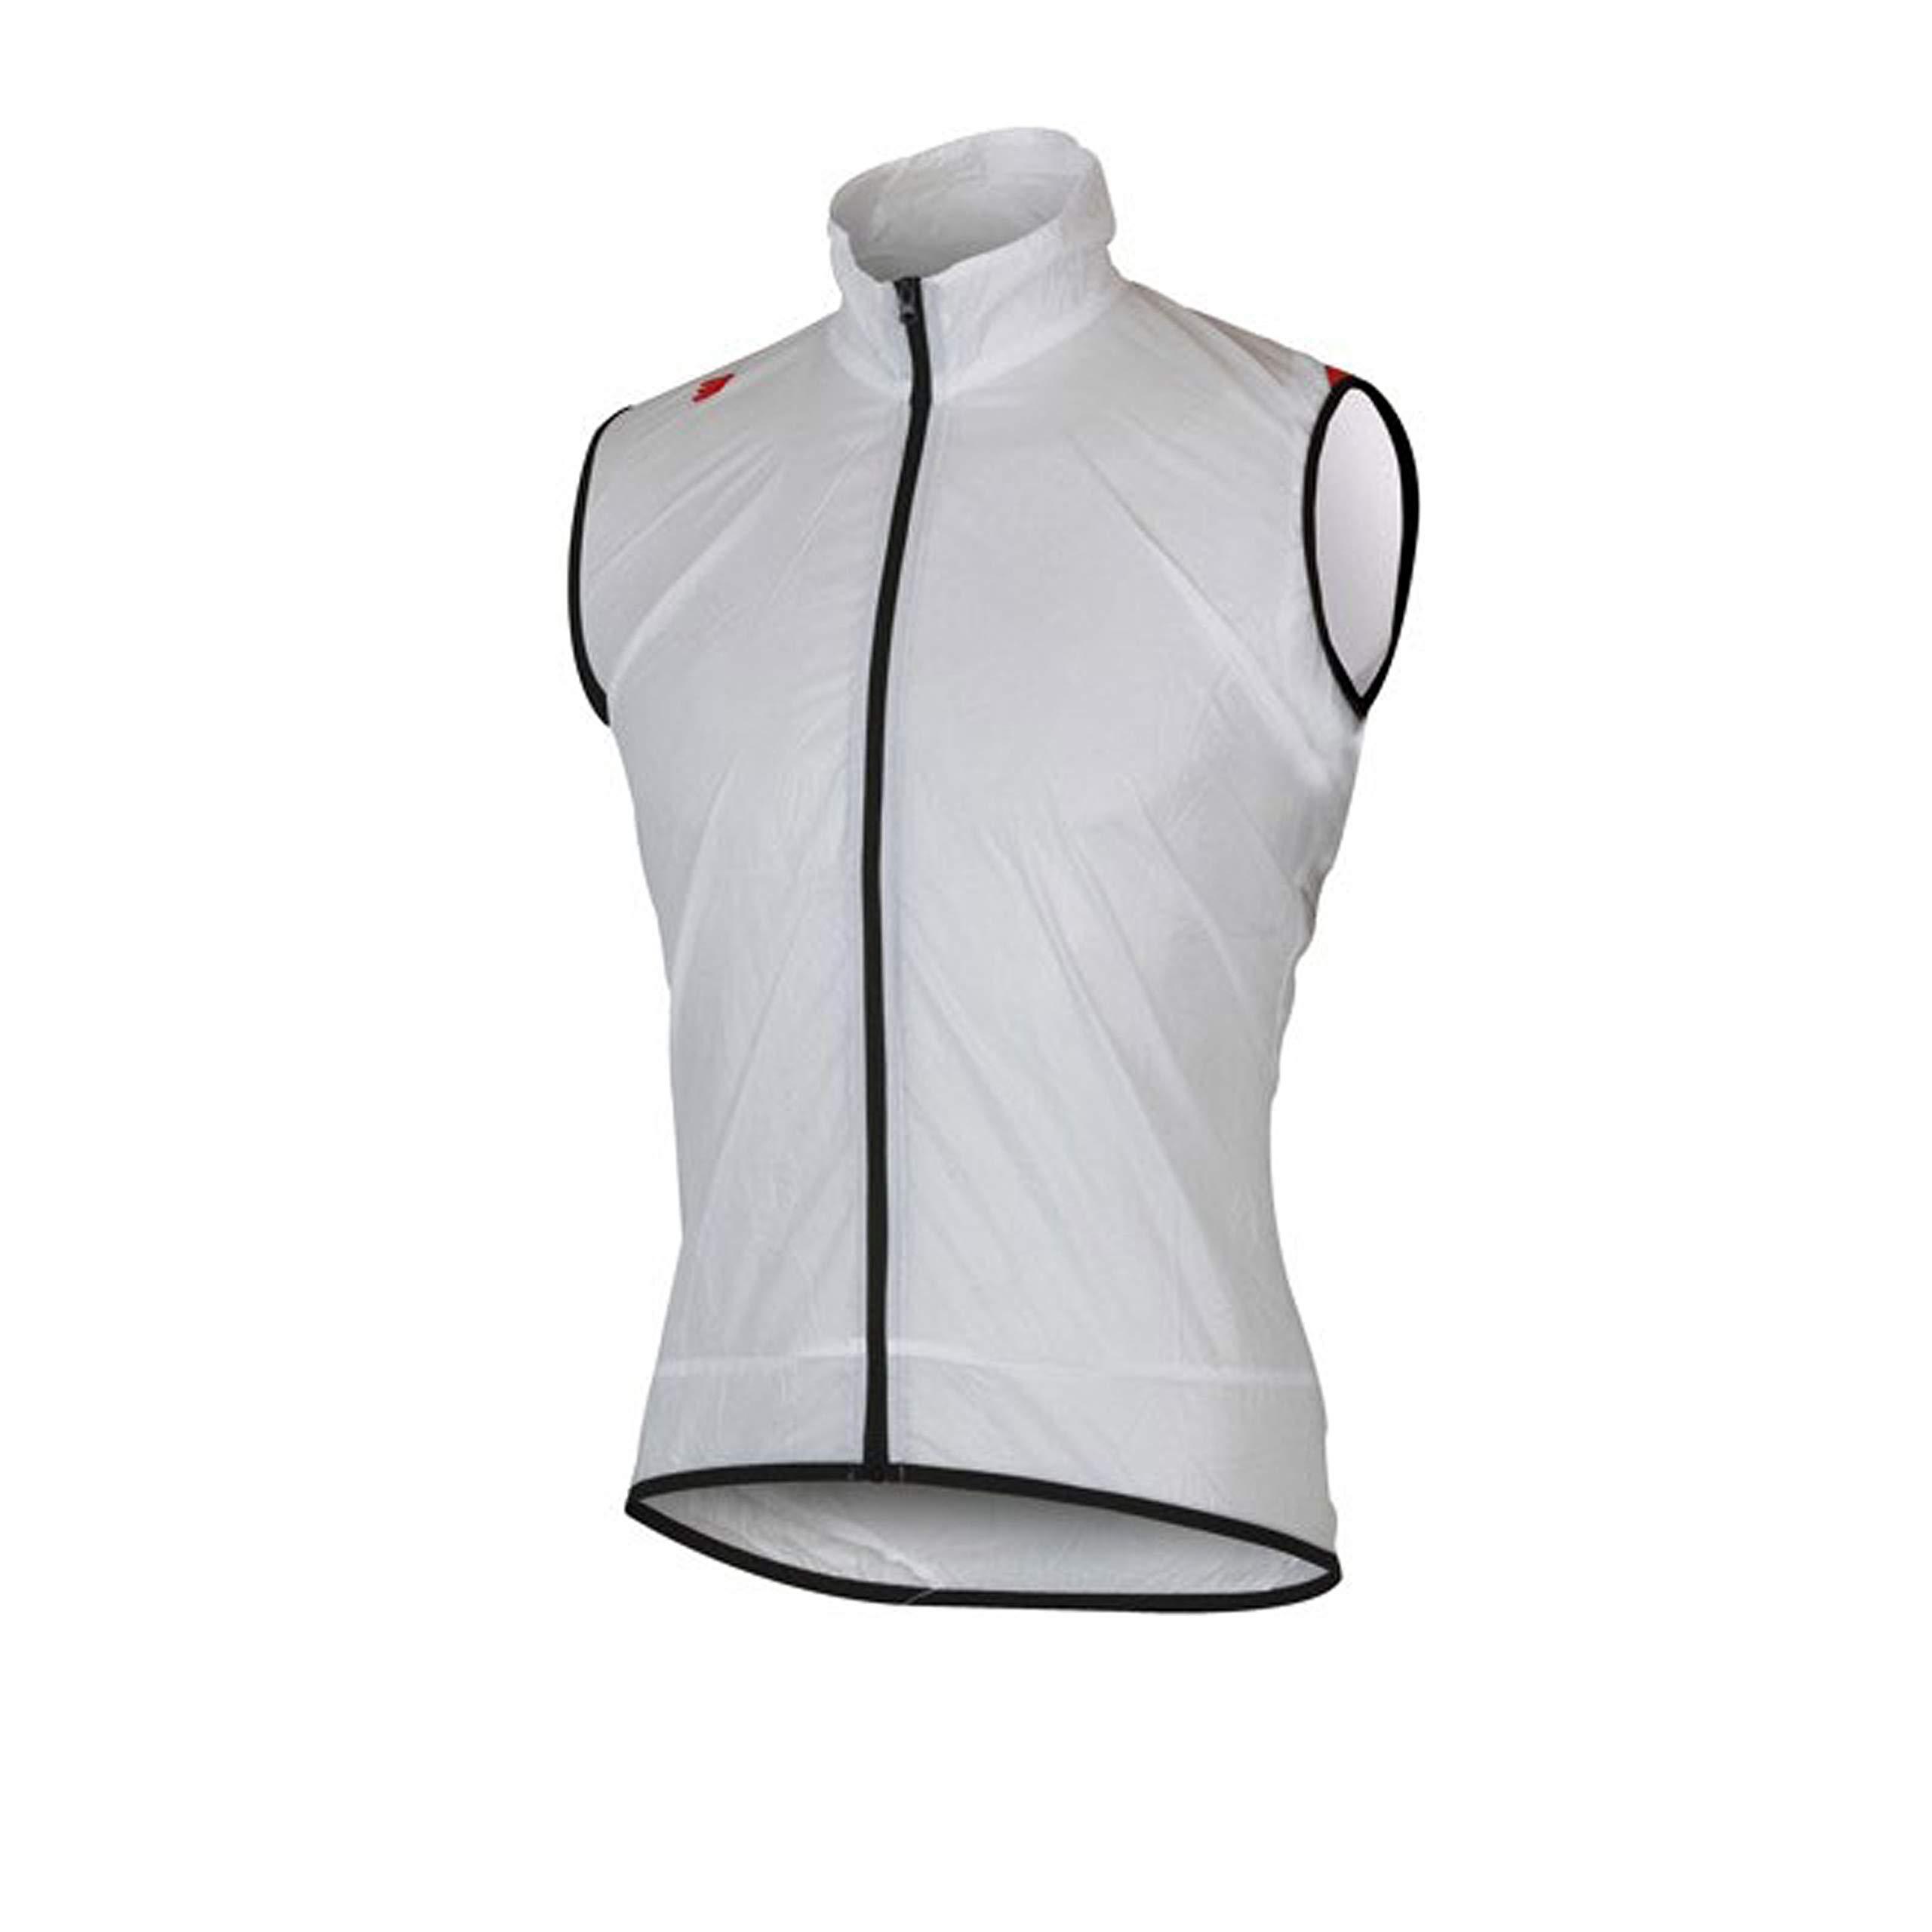 Sportful Hotpack - Chaleco, Bianco, X-Large: Amazon.es: Deportes y aire libre